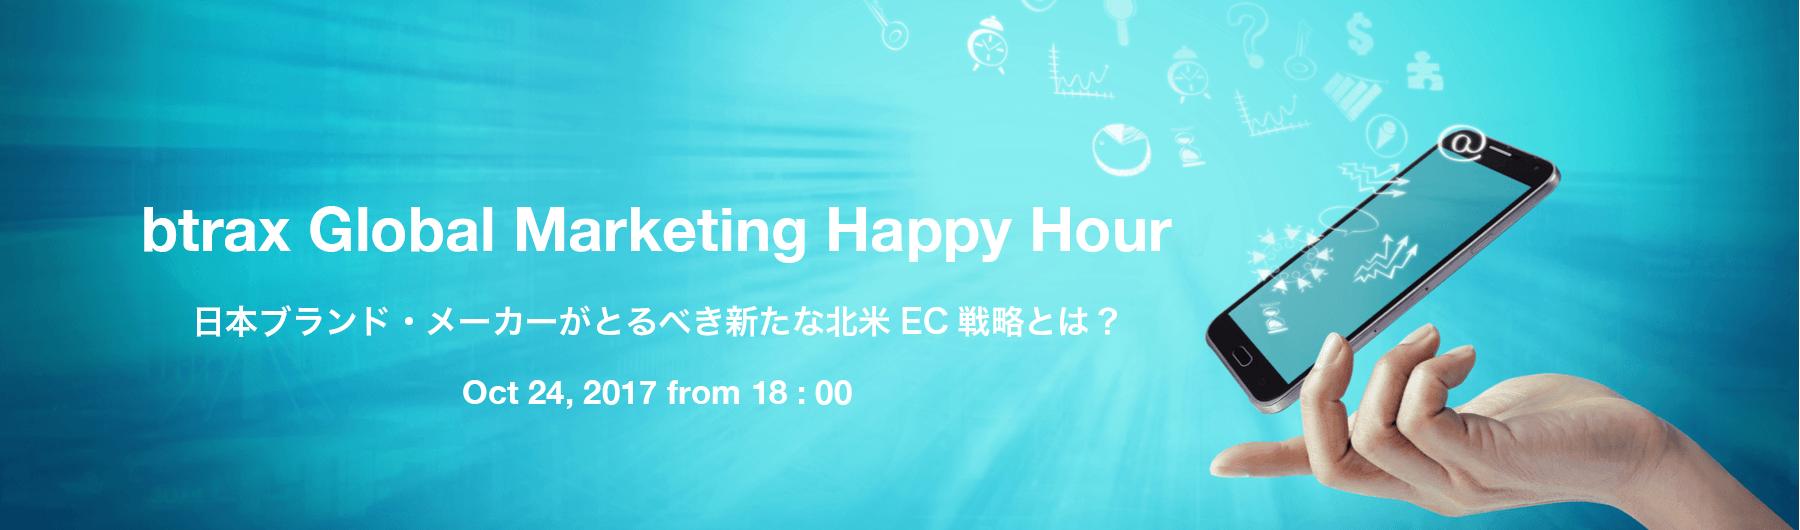 btrax Global Marketing Happy Hour